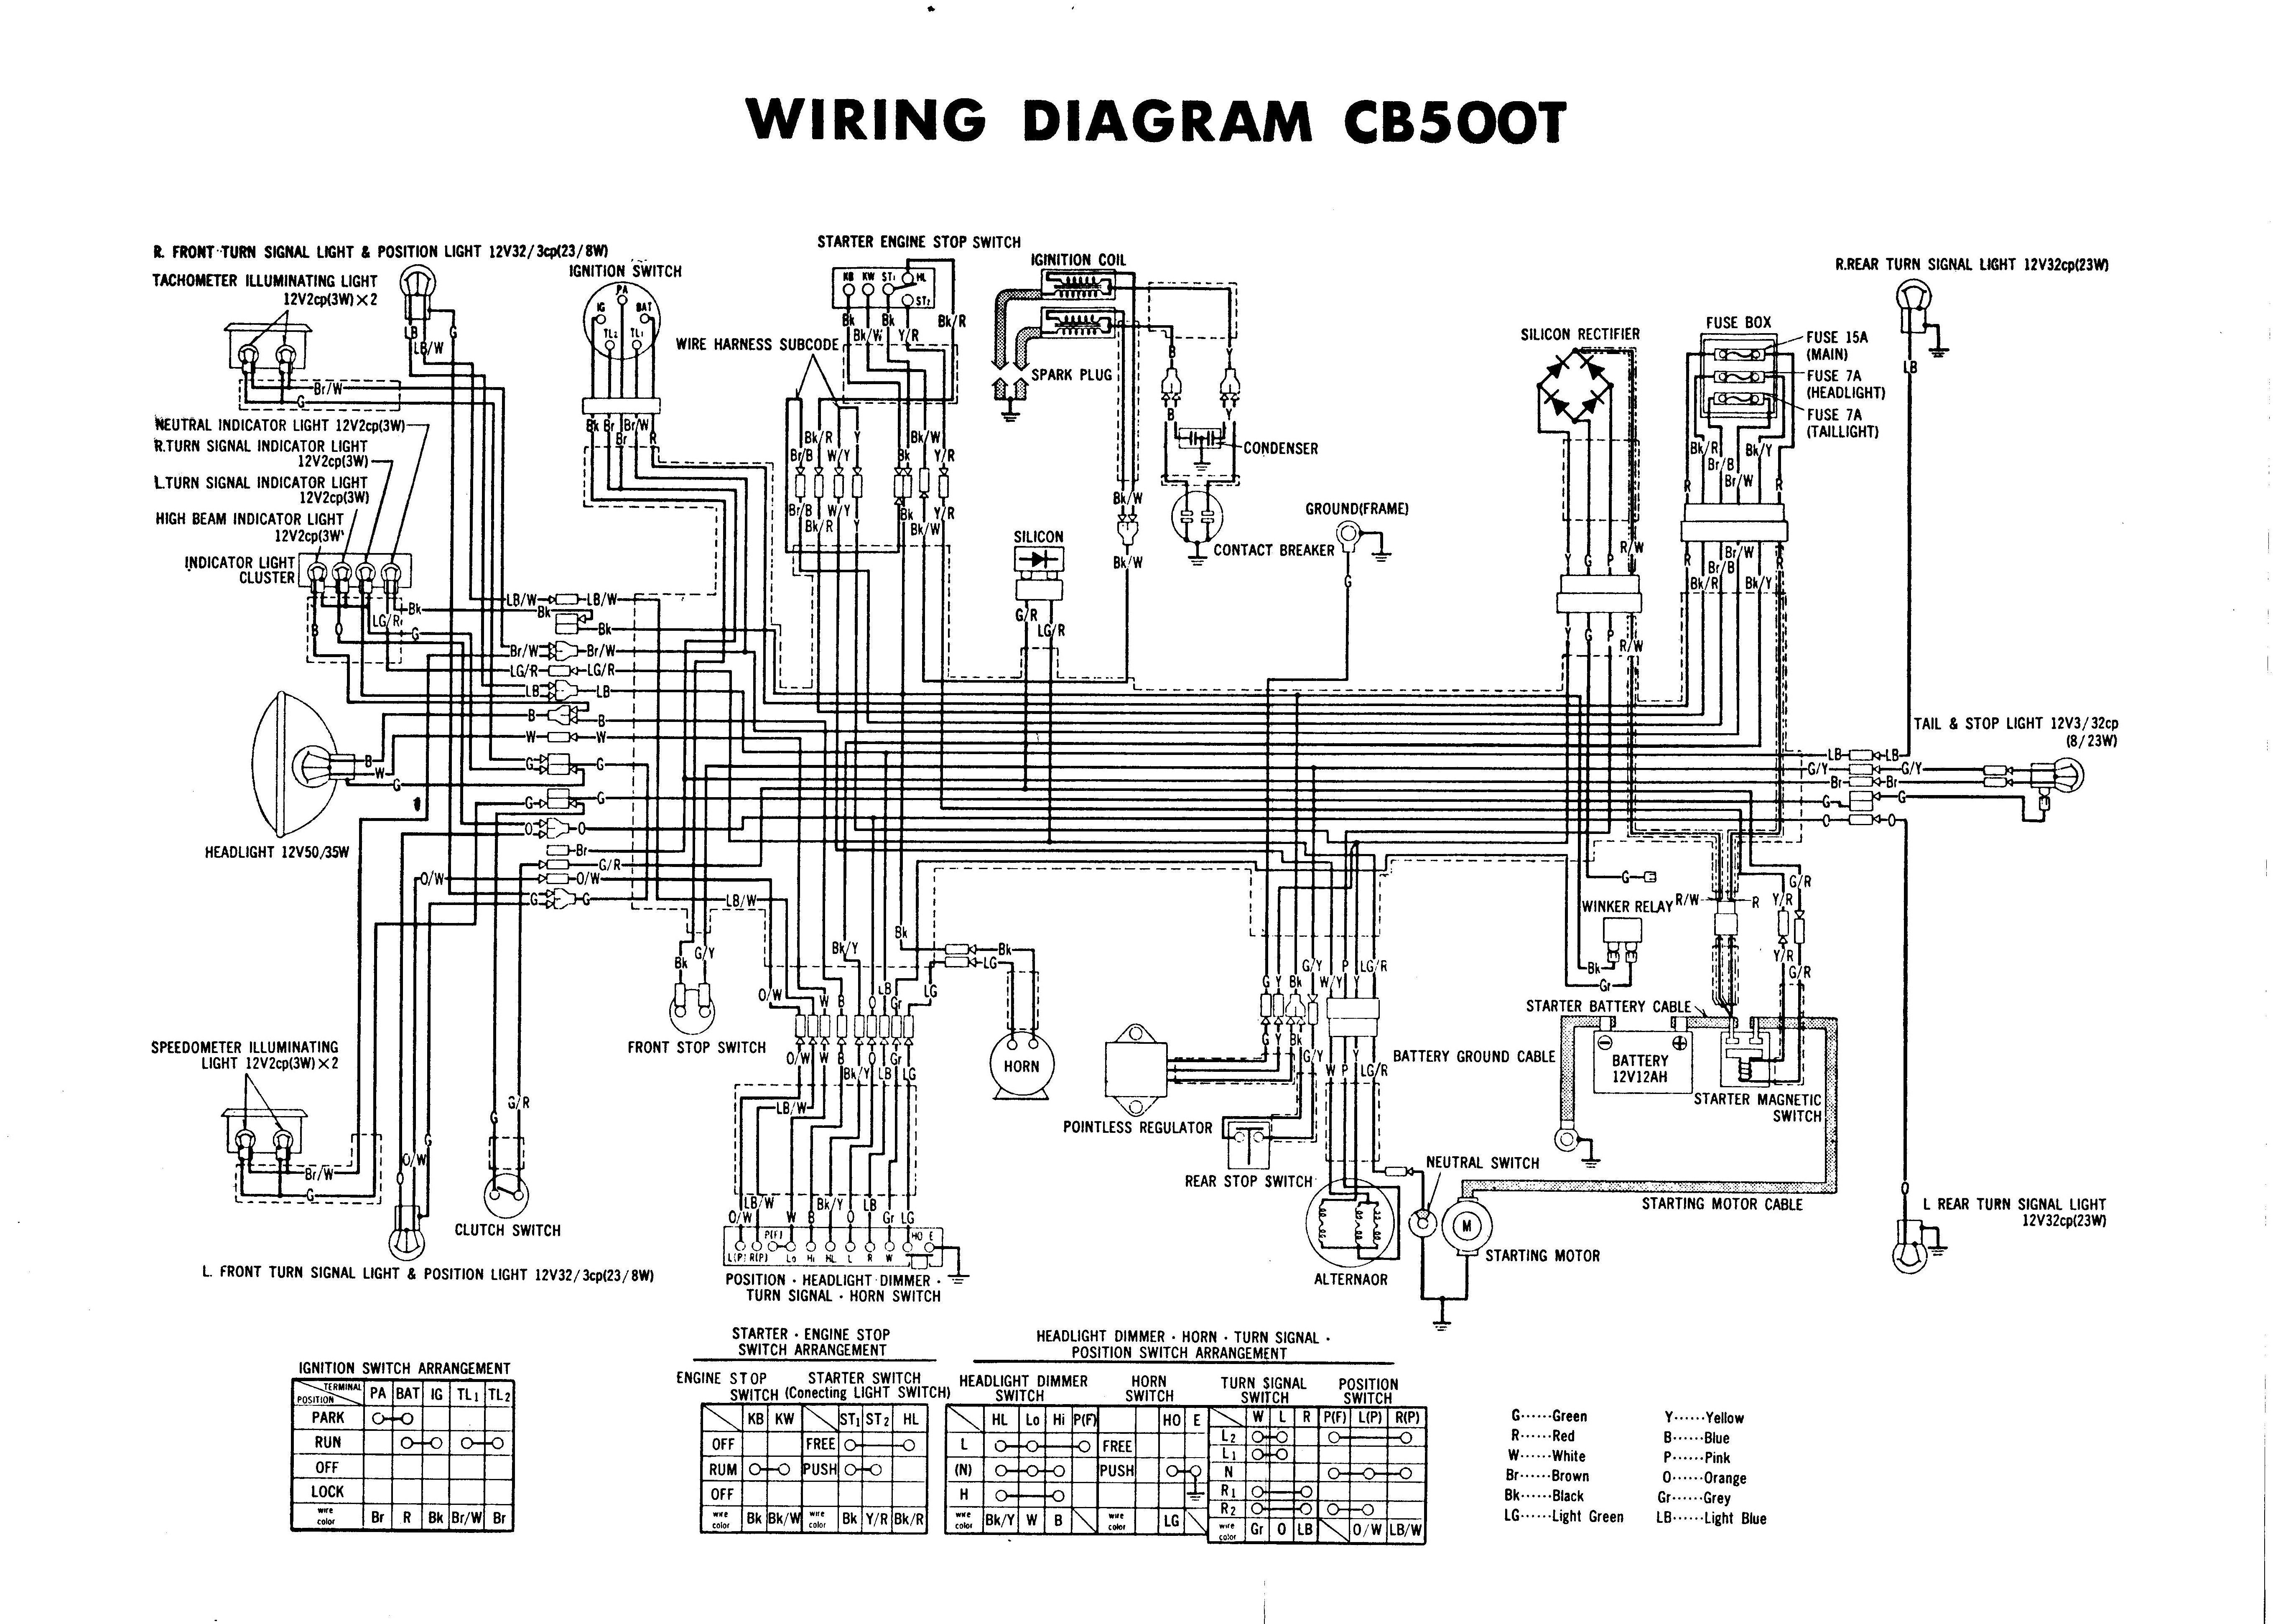 hight resolution of cb500t wiring diagram wiring diagram world honda cb500t wiring diagram cb500t wiring diagram wiring diagram expert